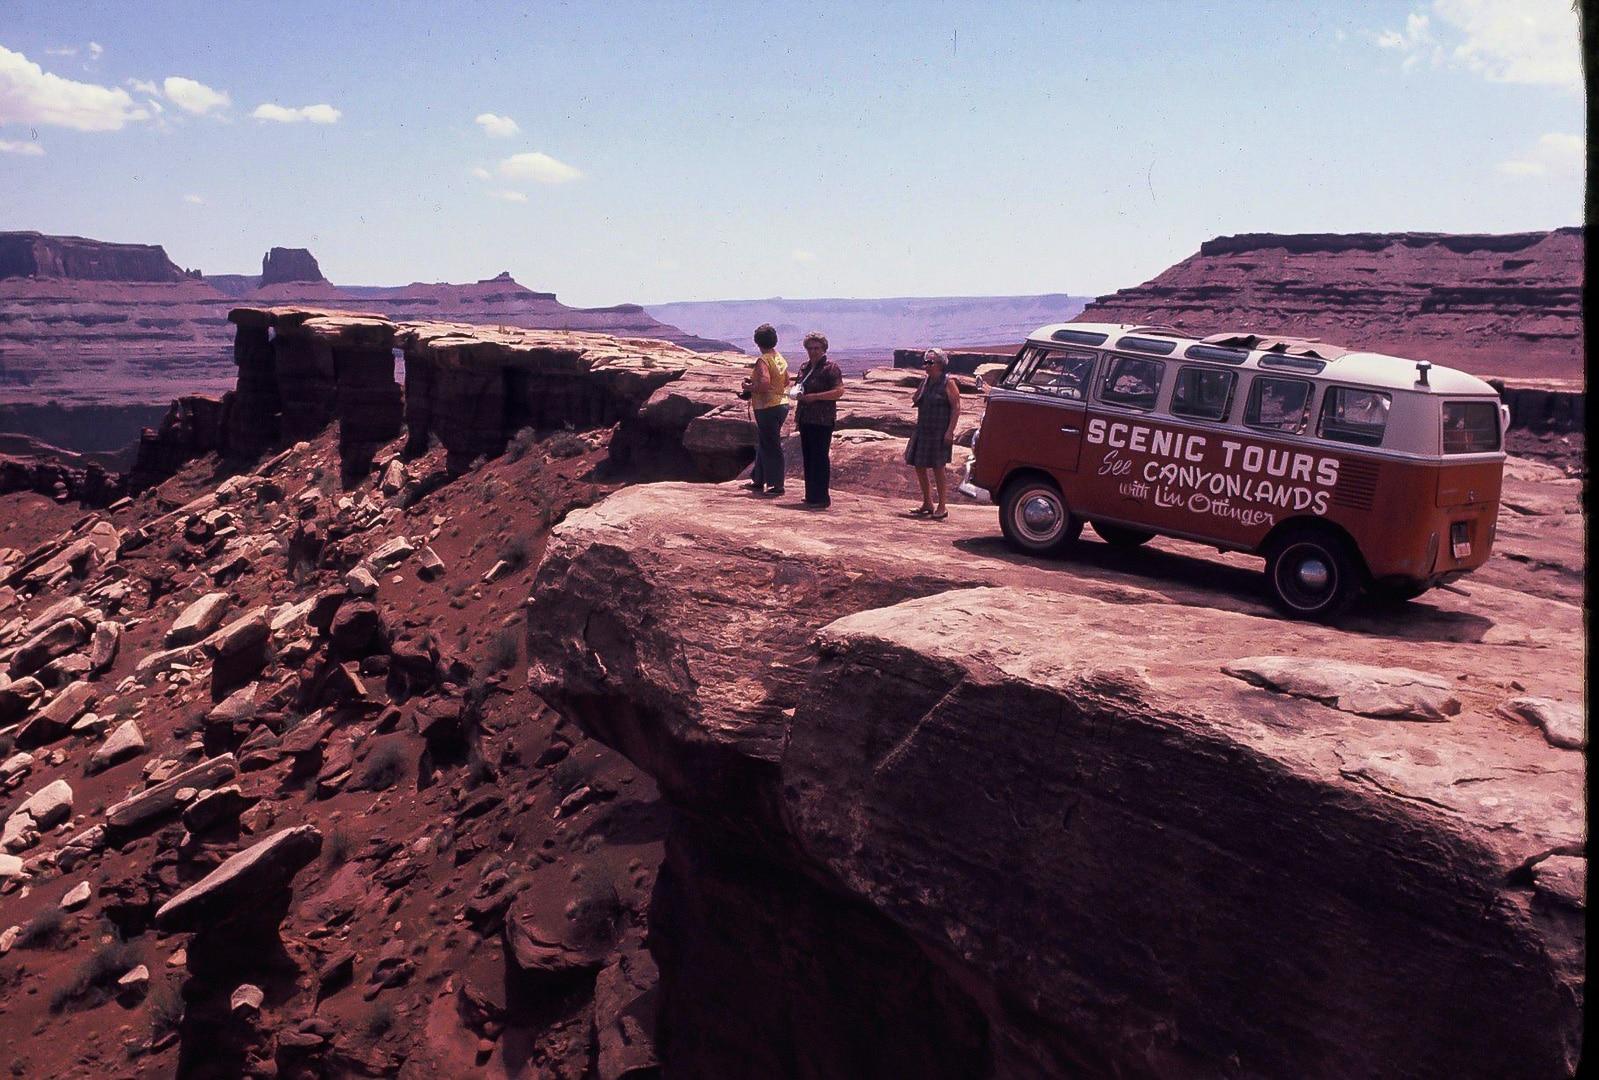 Lin Ottinger Canyon Land Scenic Tour VW Bus - BeCombi - Une-37